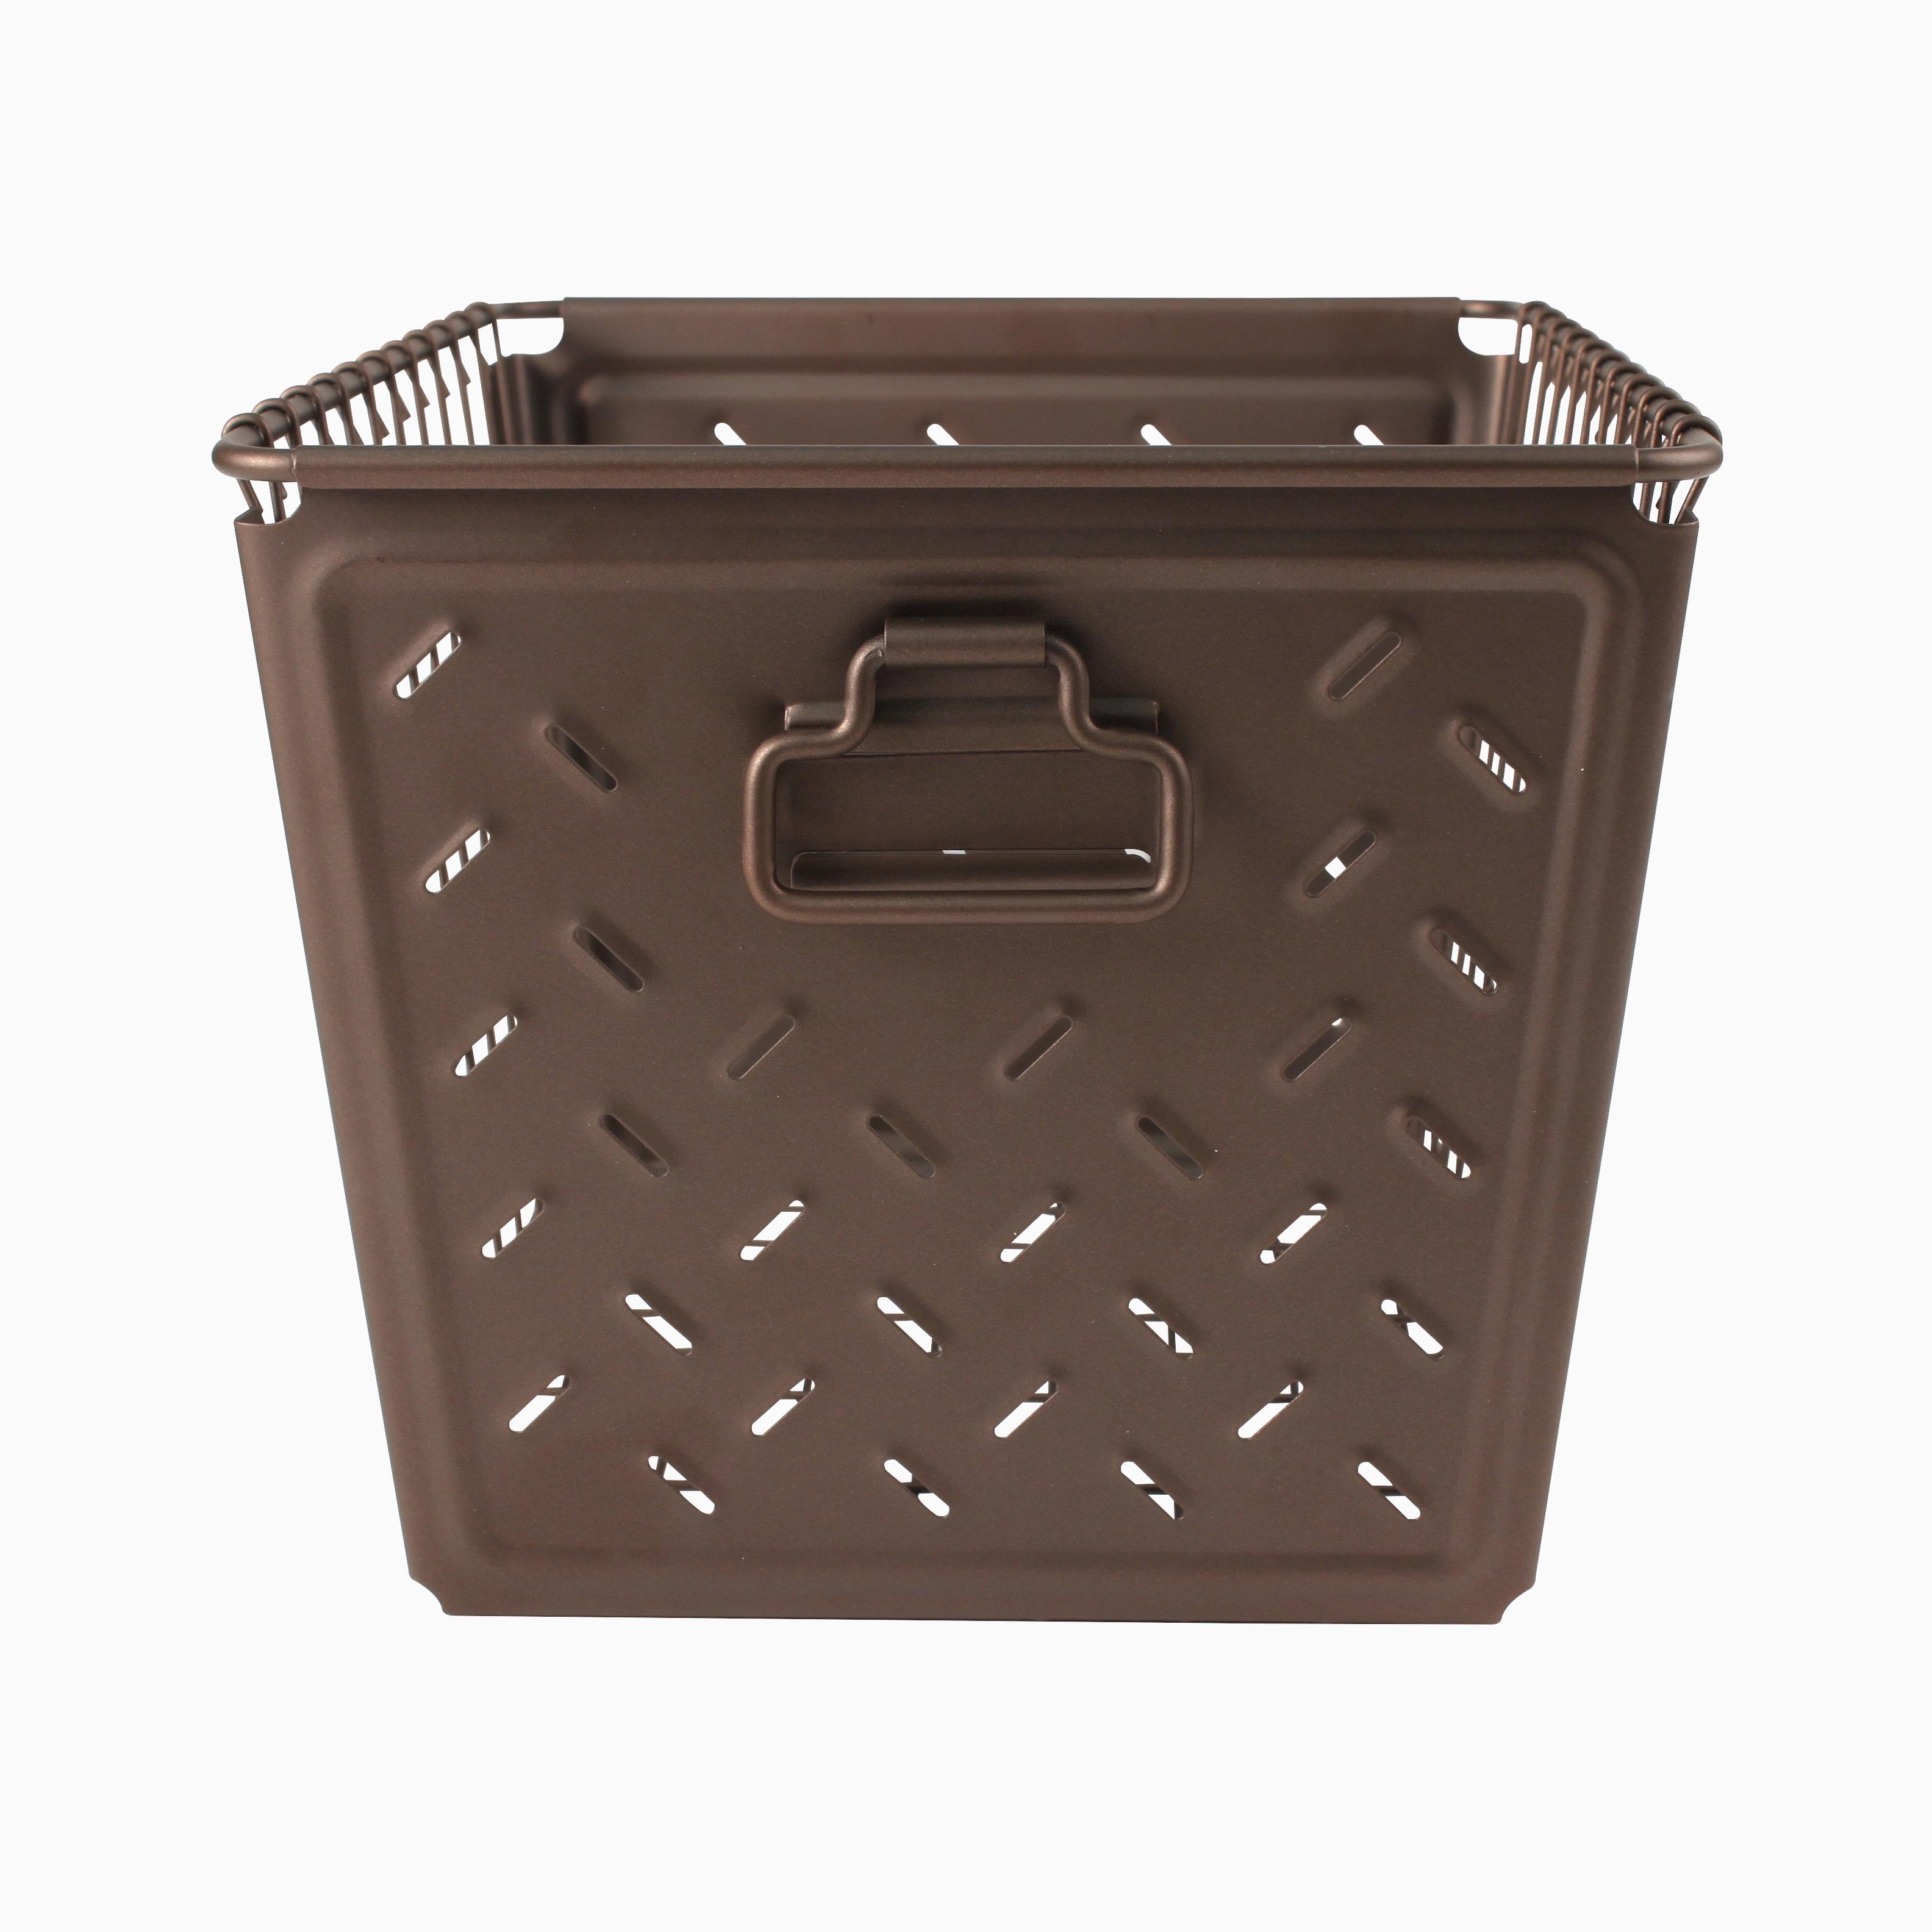 Nordic Felt Storage Basket Small Storage Basket Desk Small Storage Basket Simple Key Jewelry Storage Box